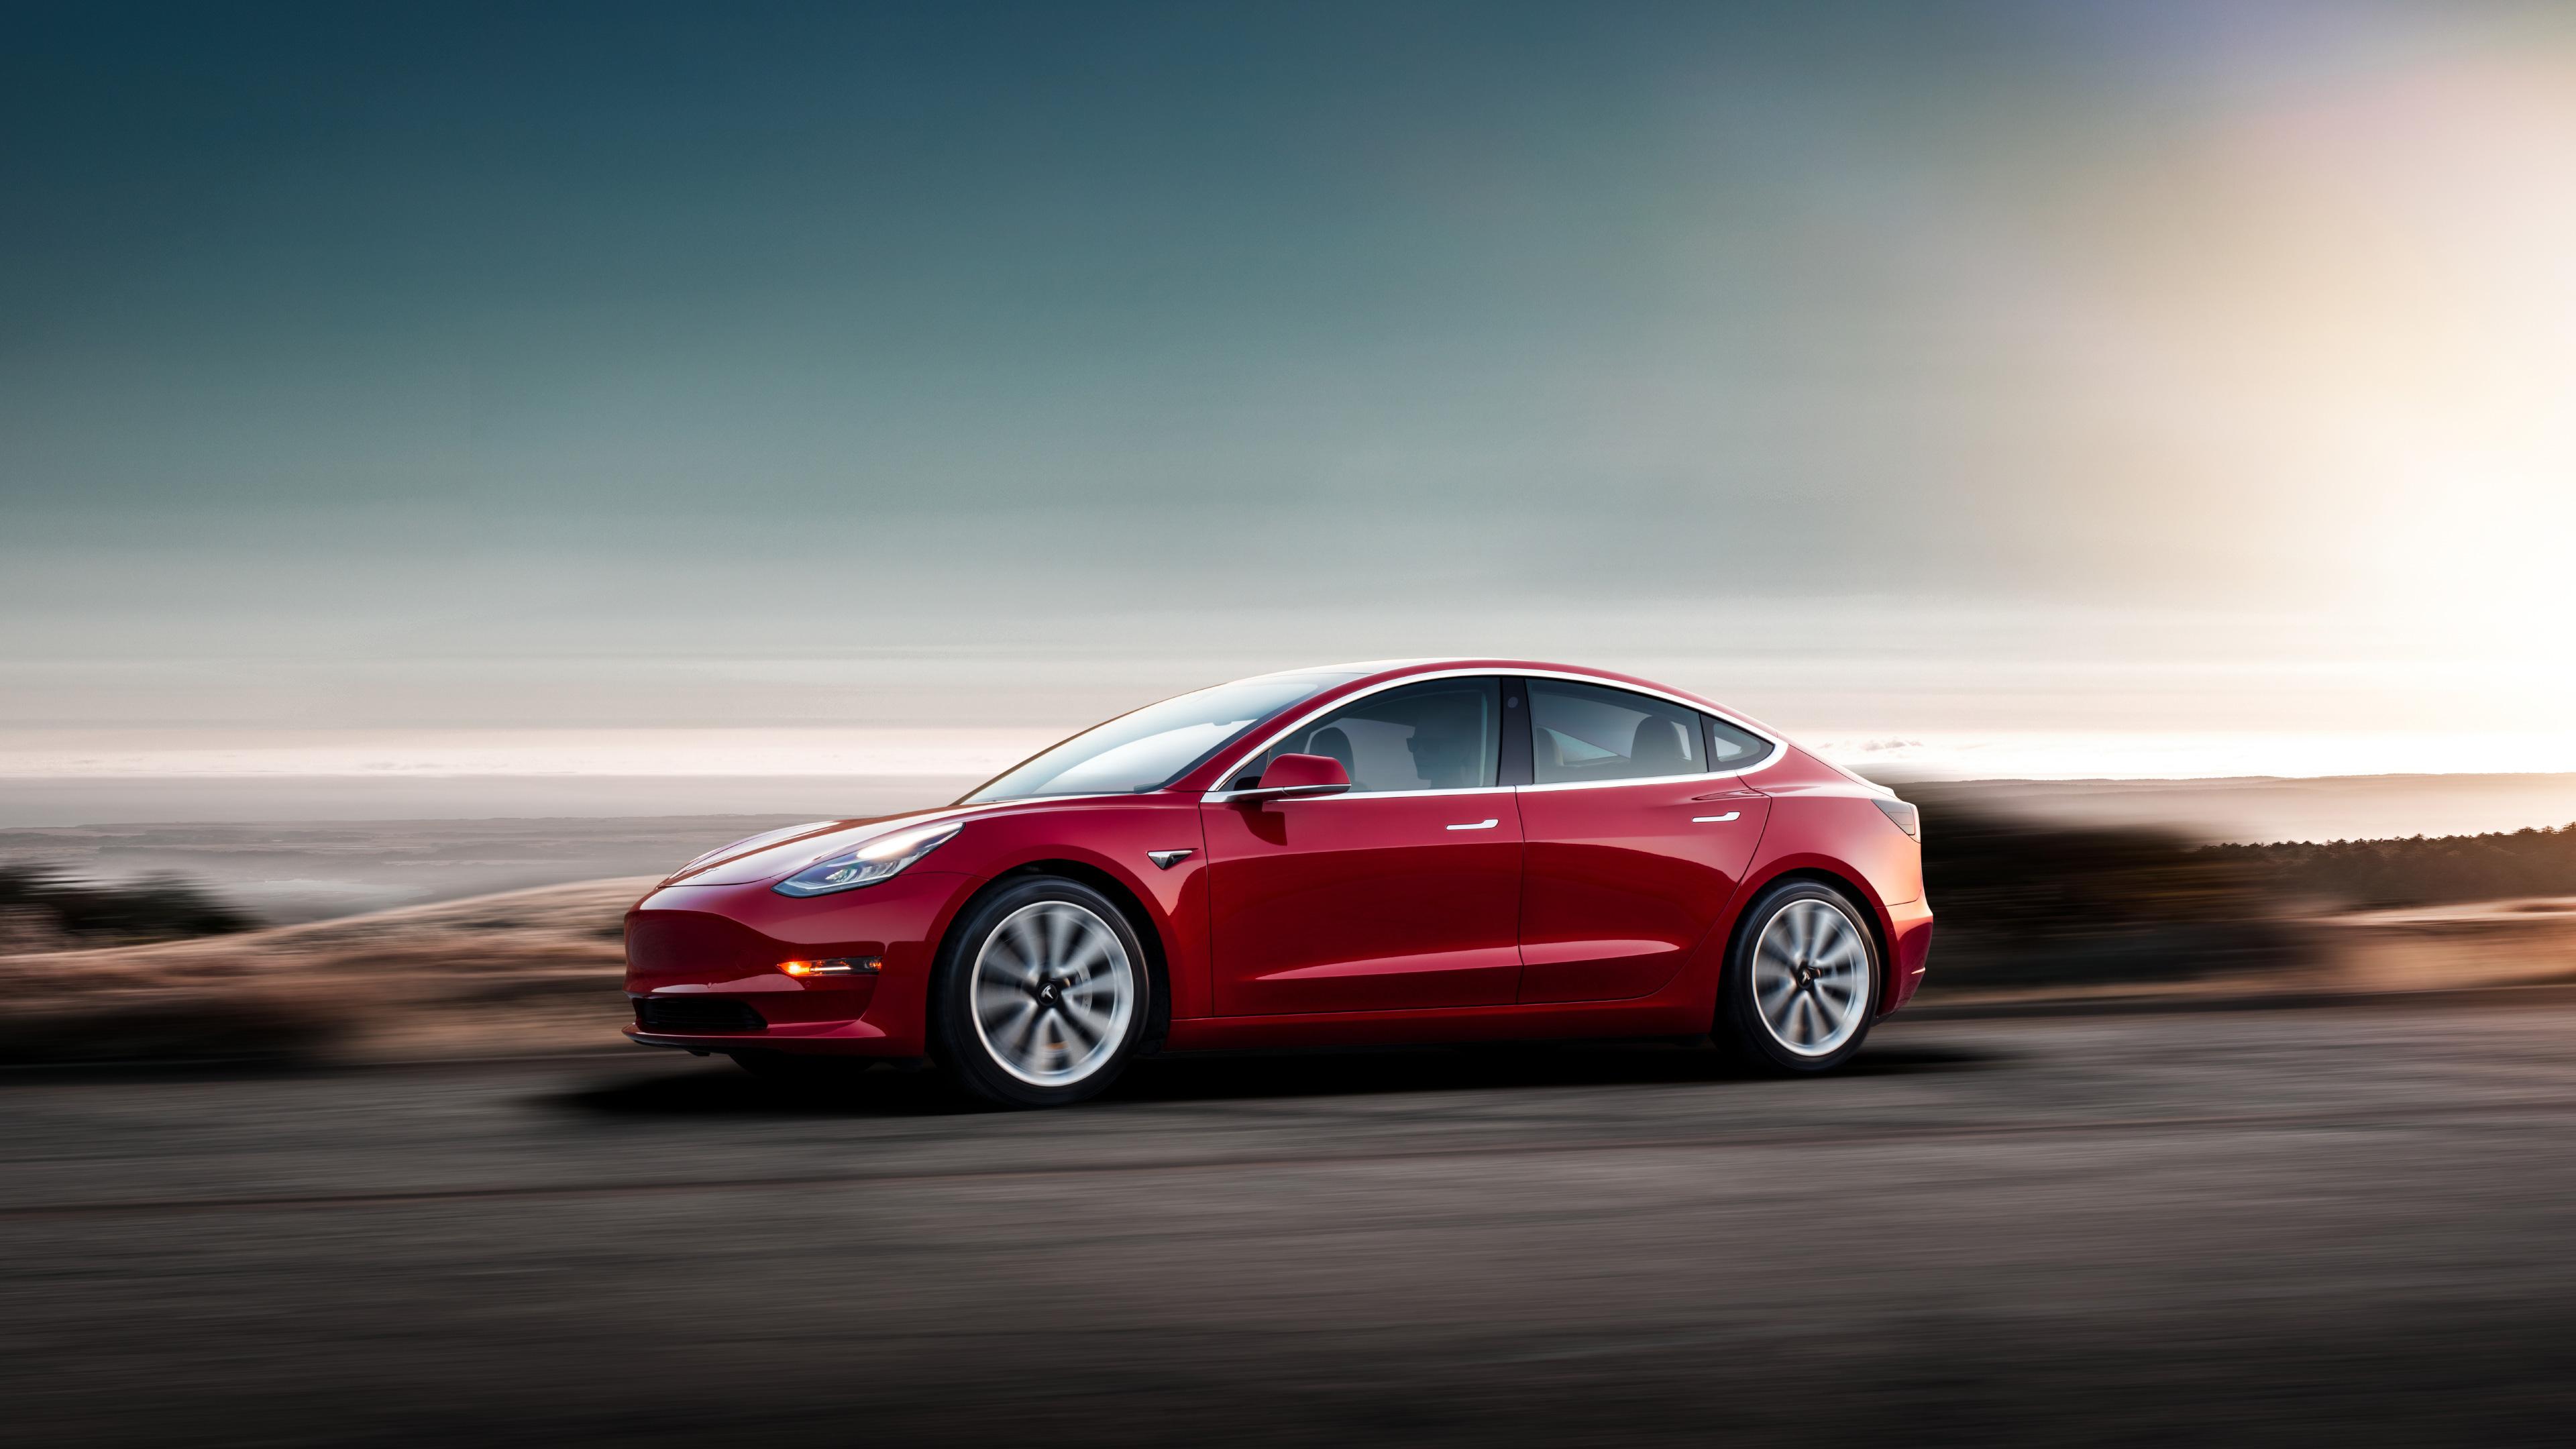 2018 tesla model 3 1539107623 - 2018 Tesla Model 3 - tesla wallpapers, tesla model 3 wallpapers, hd-wallpapers, cars wallpapers, 4k-wallpapers, 2018 cars wallpapers